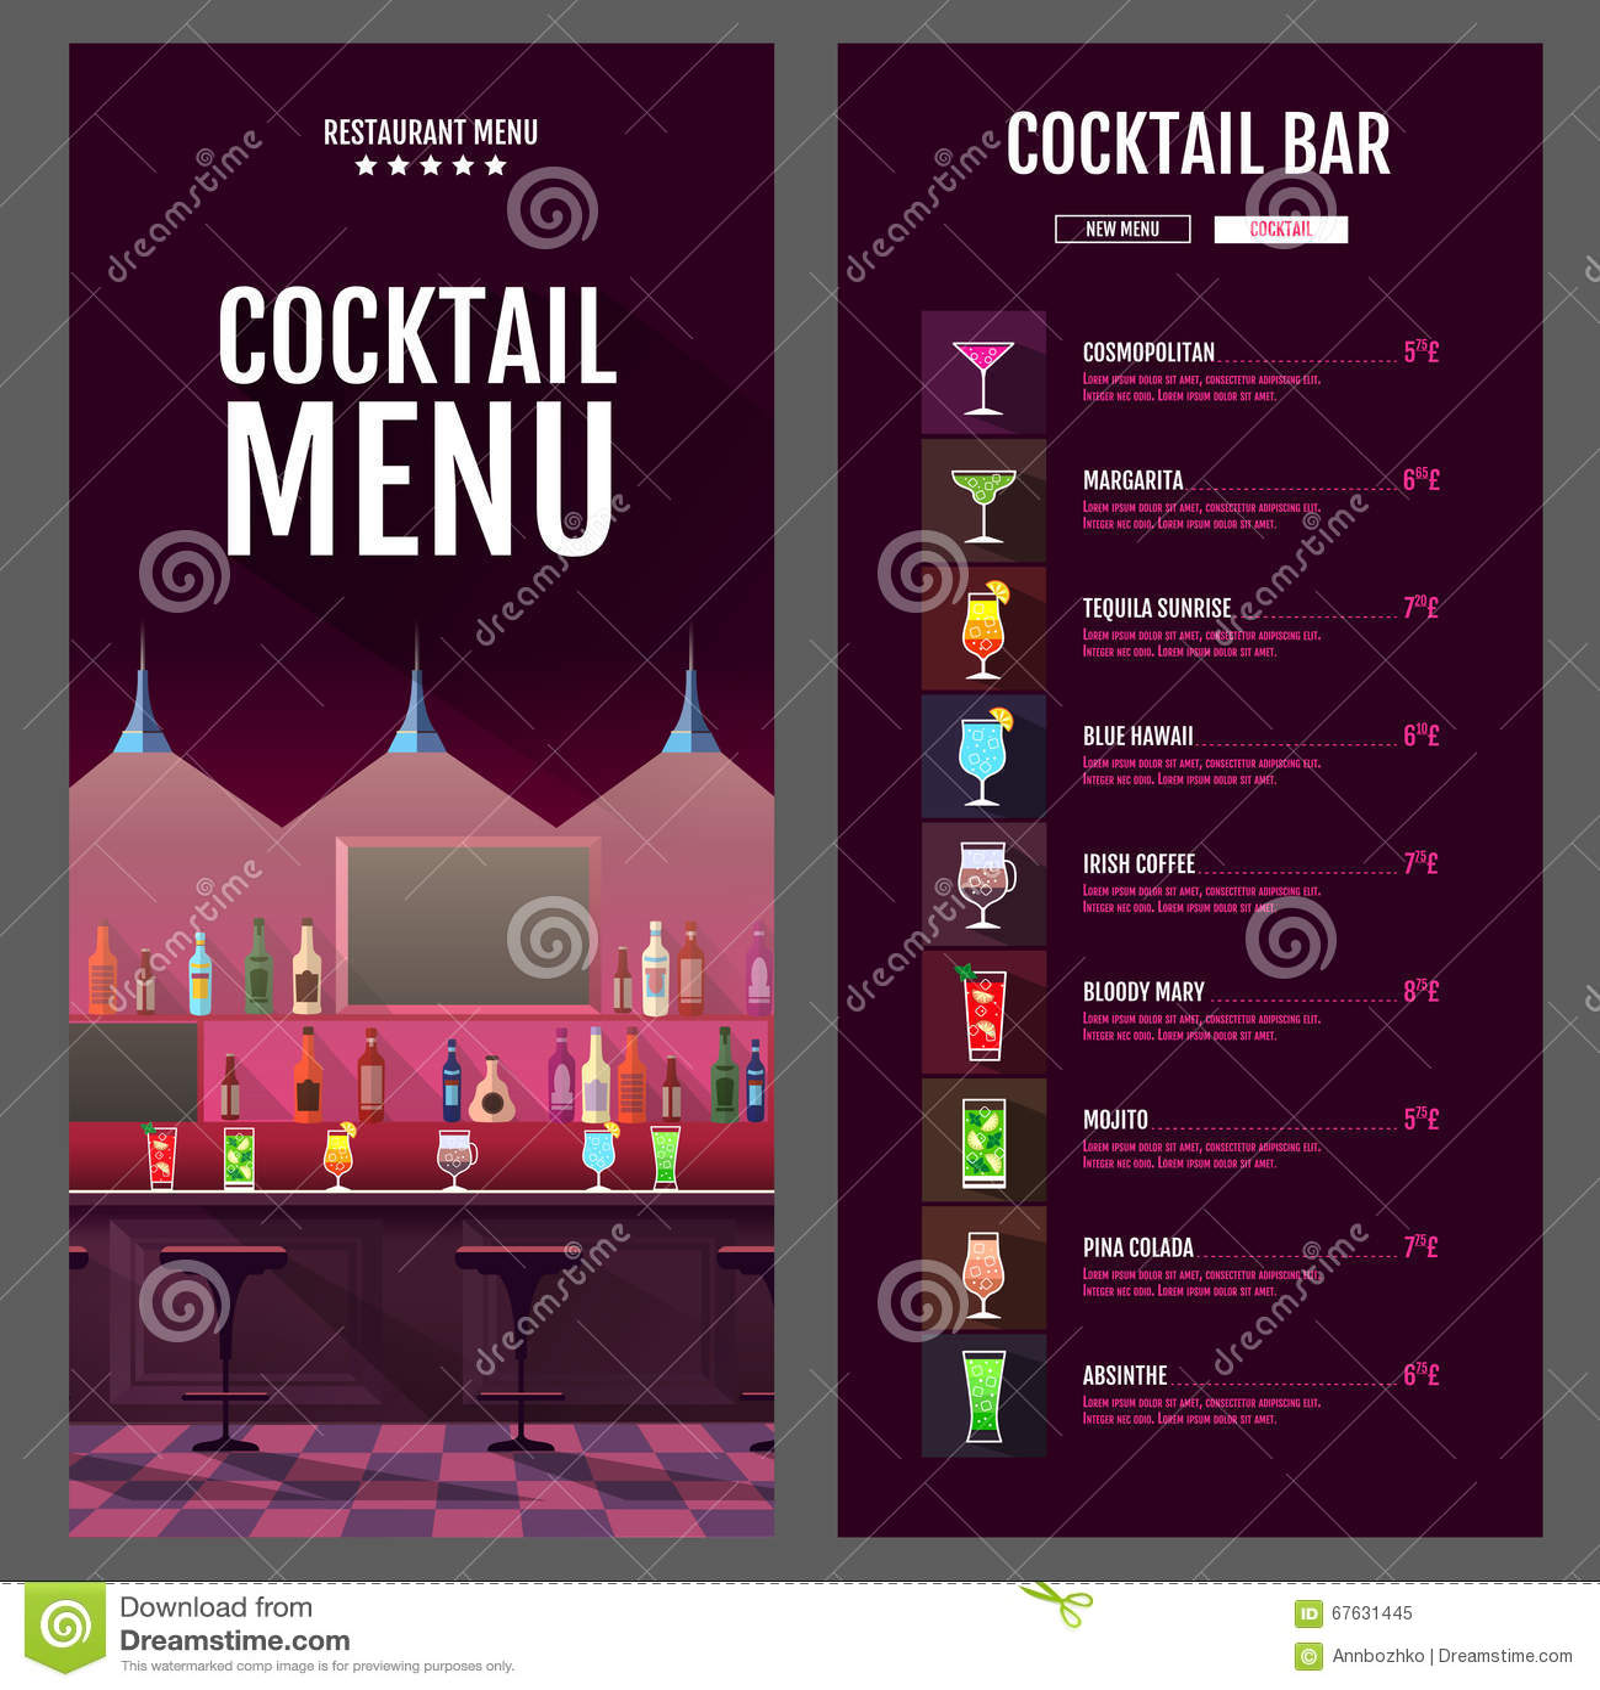 cocktail book pdf free download